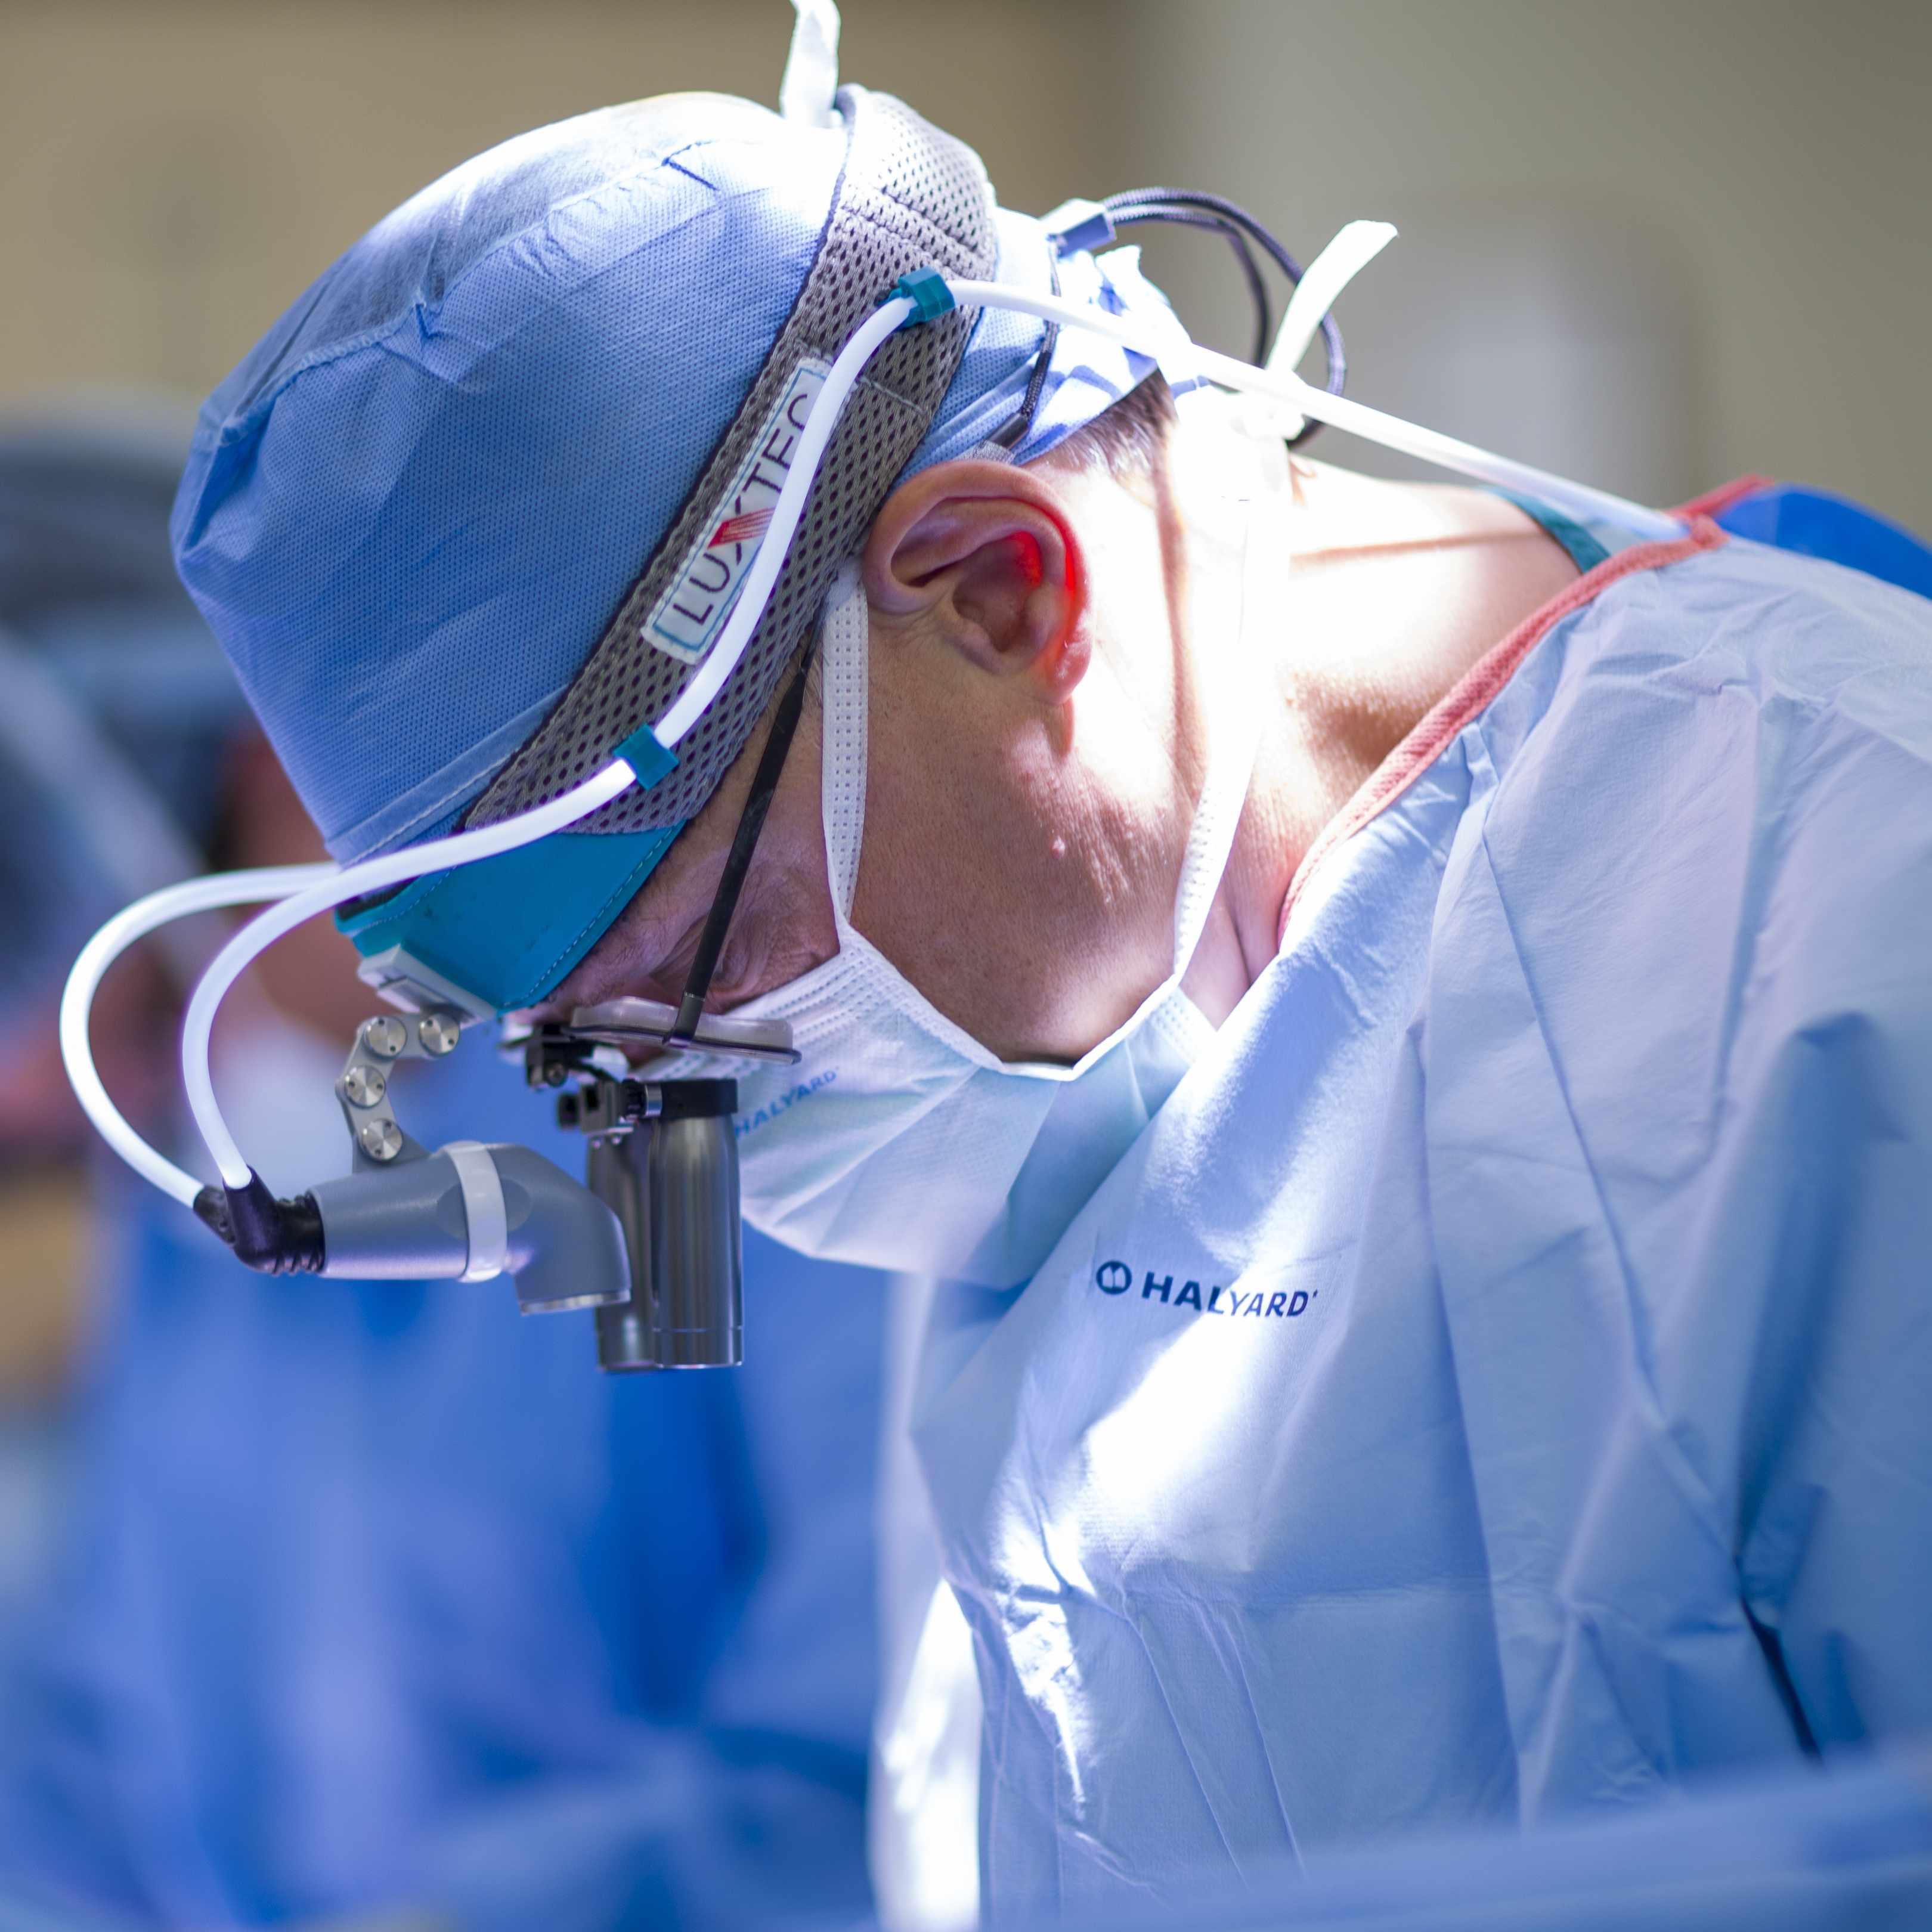 close-up of transplant surgeon performing surgery